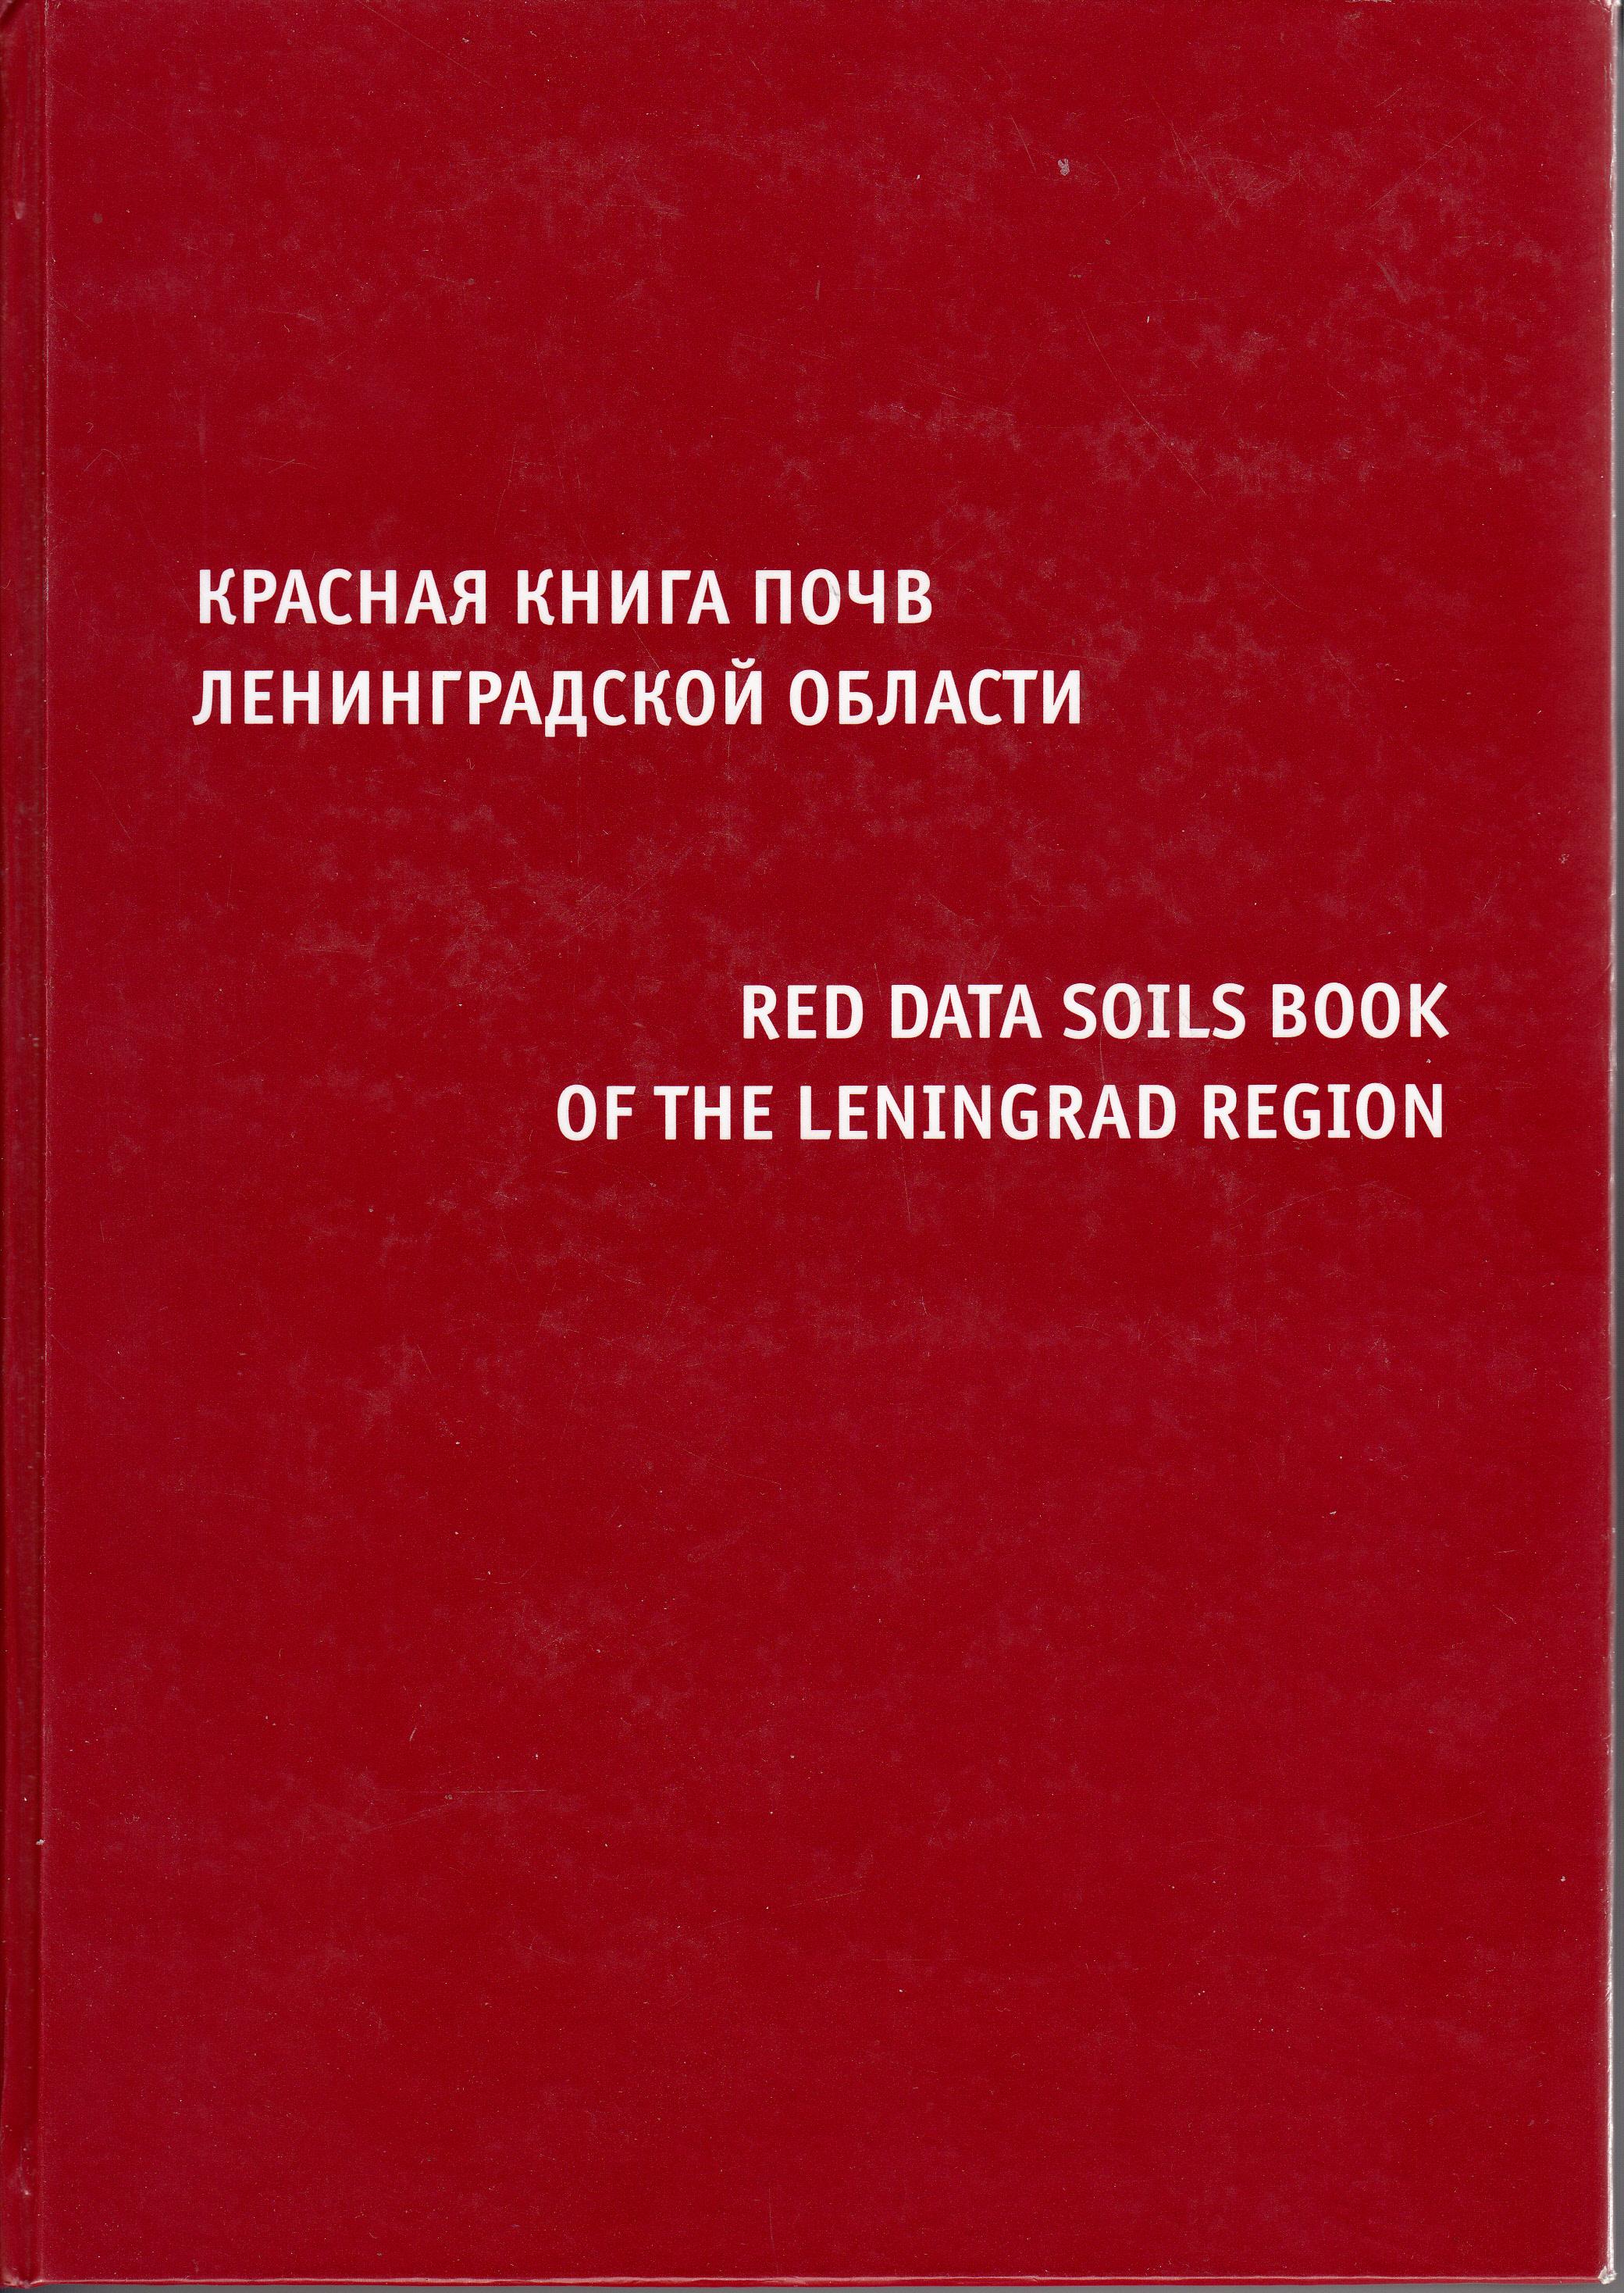 Красная книга почв ЛО